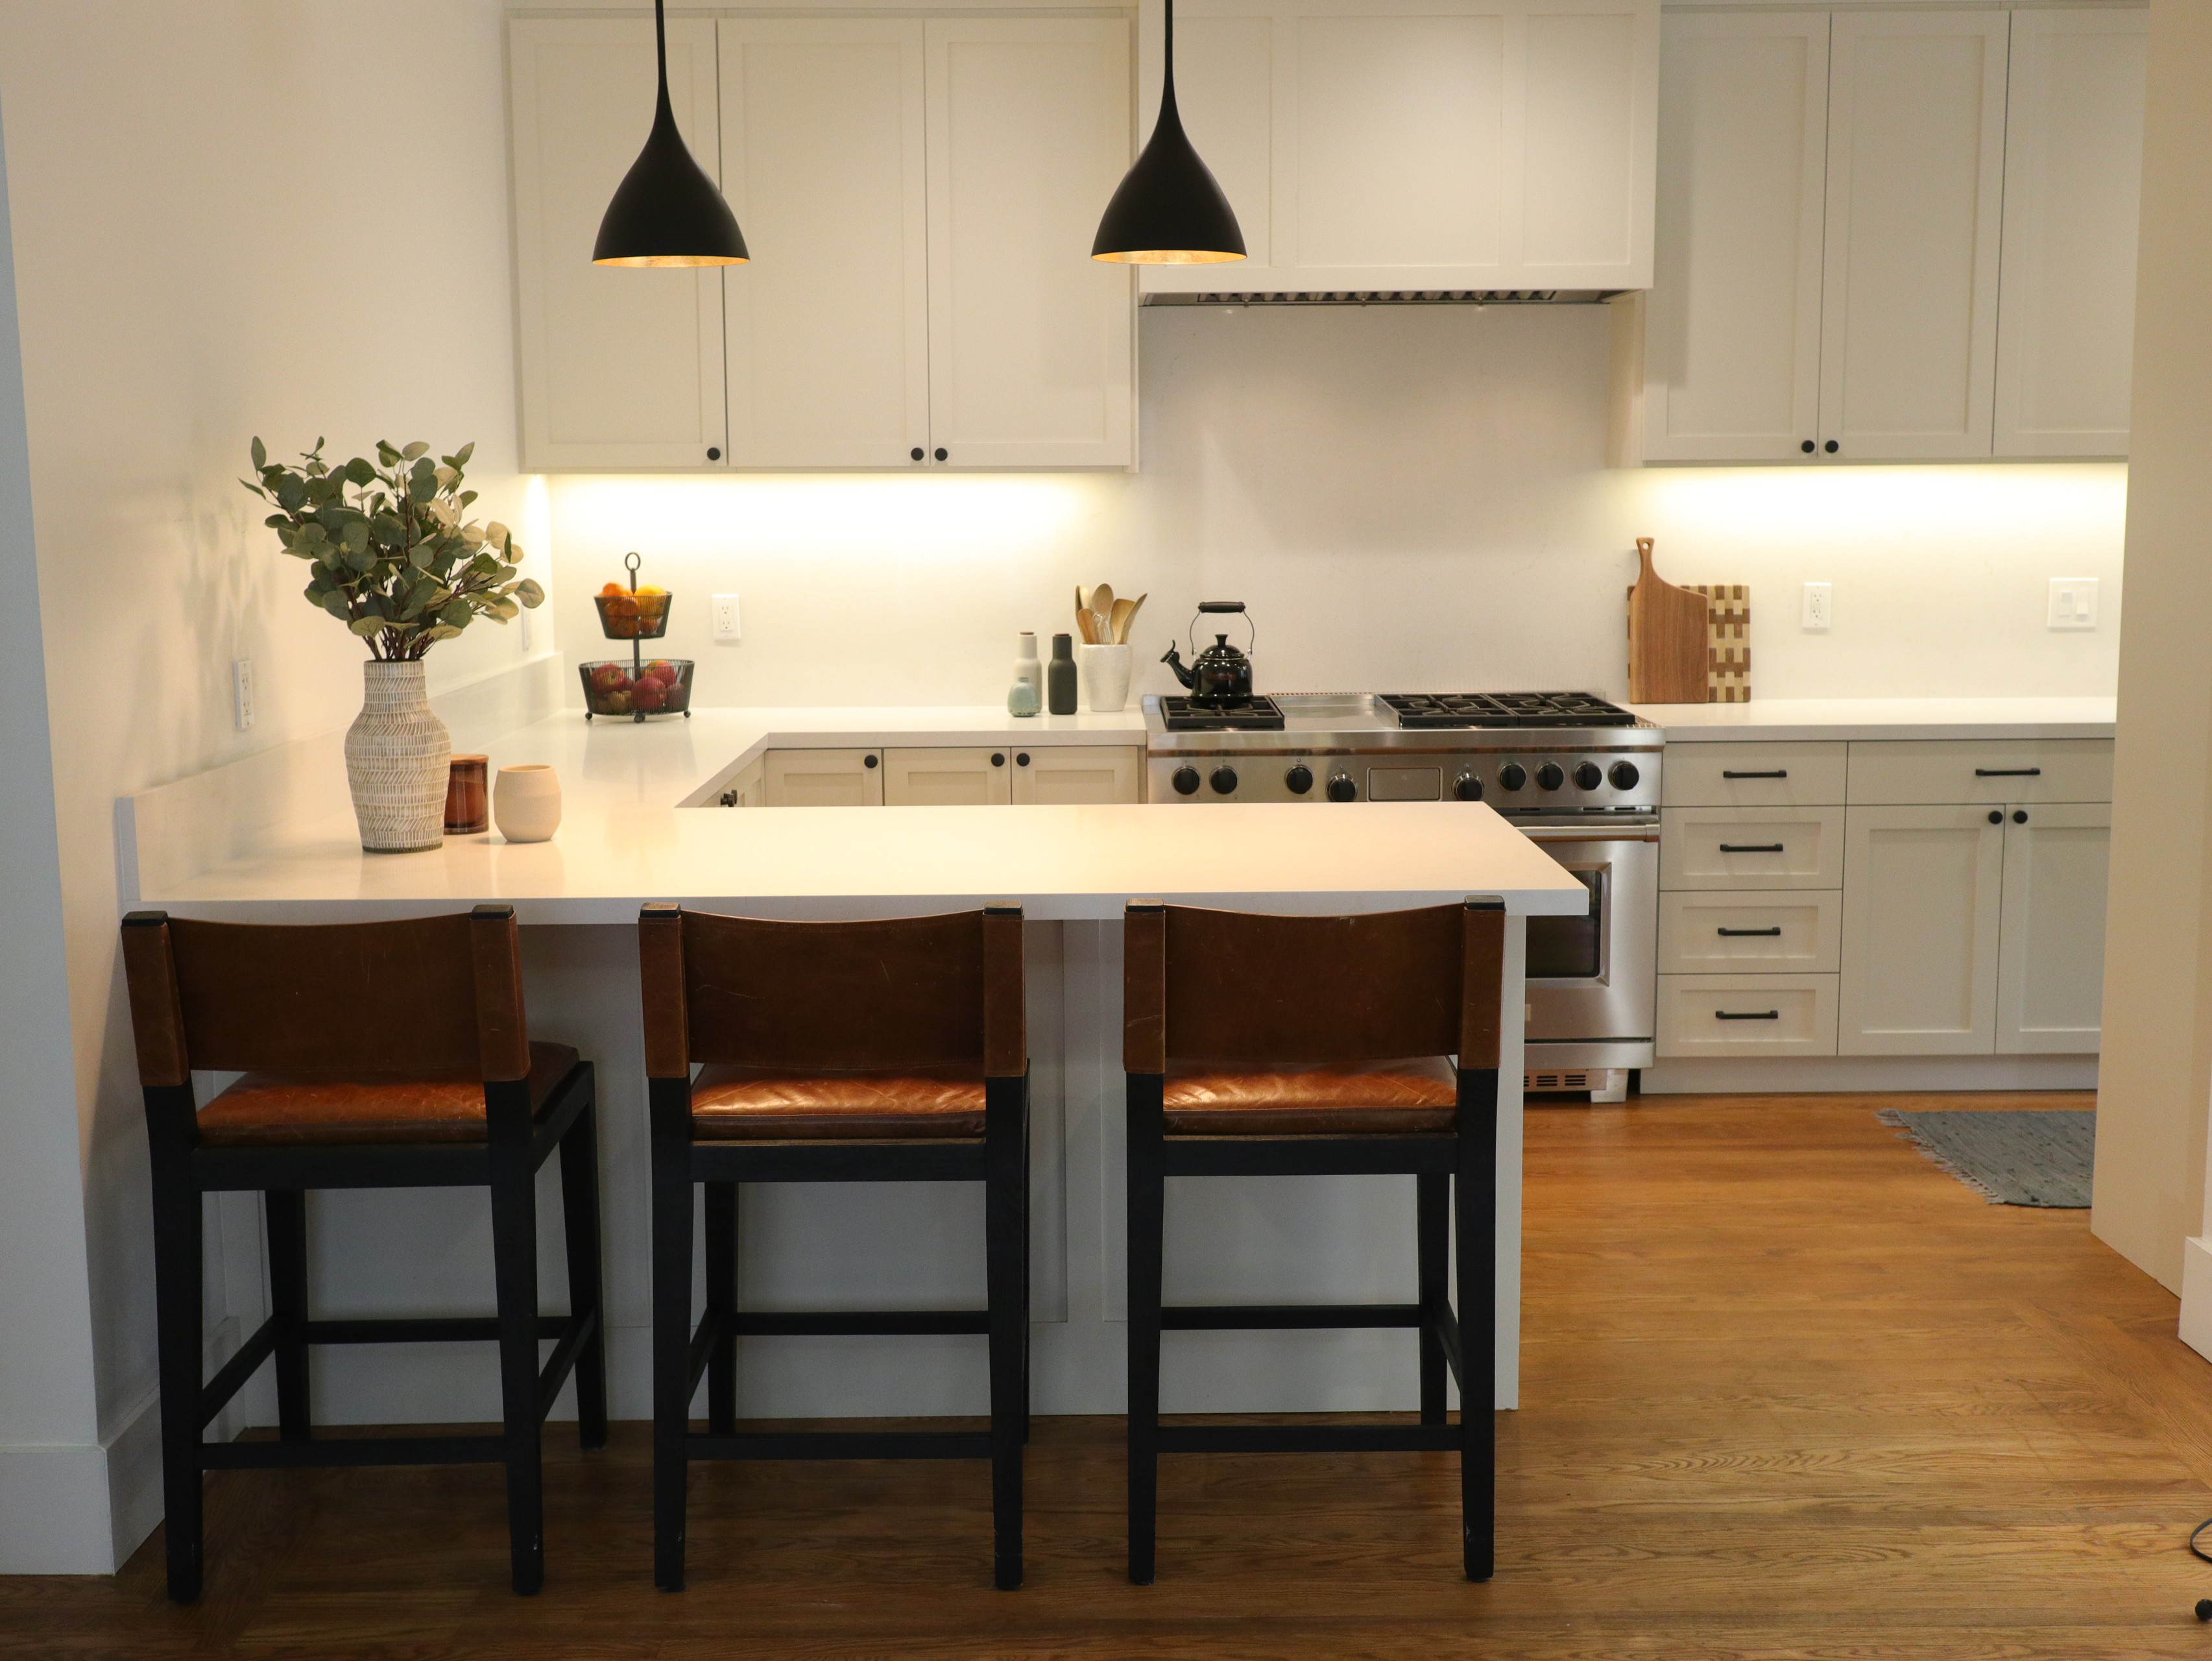 Oakland Modern Kitchen remodel